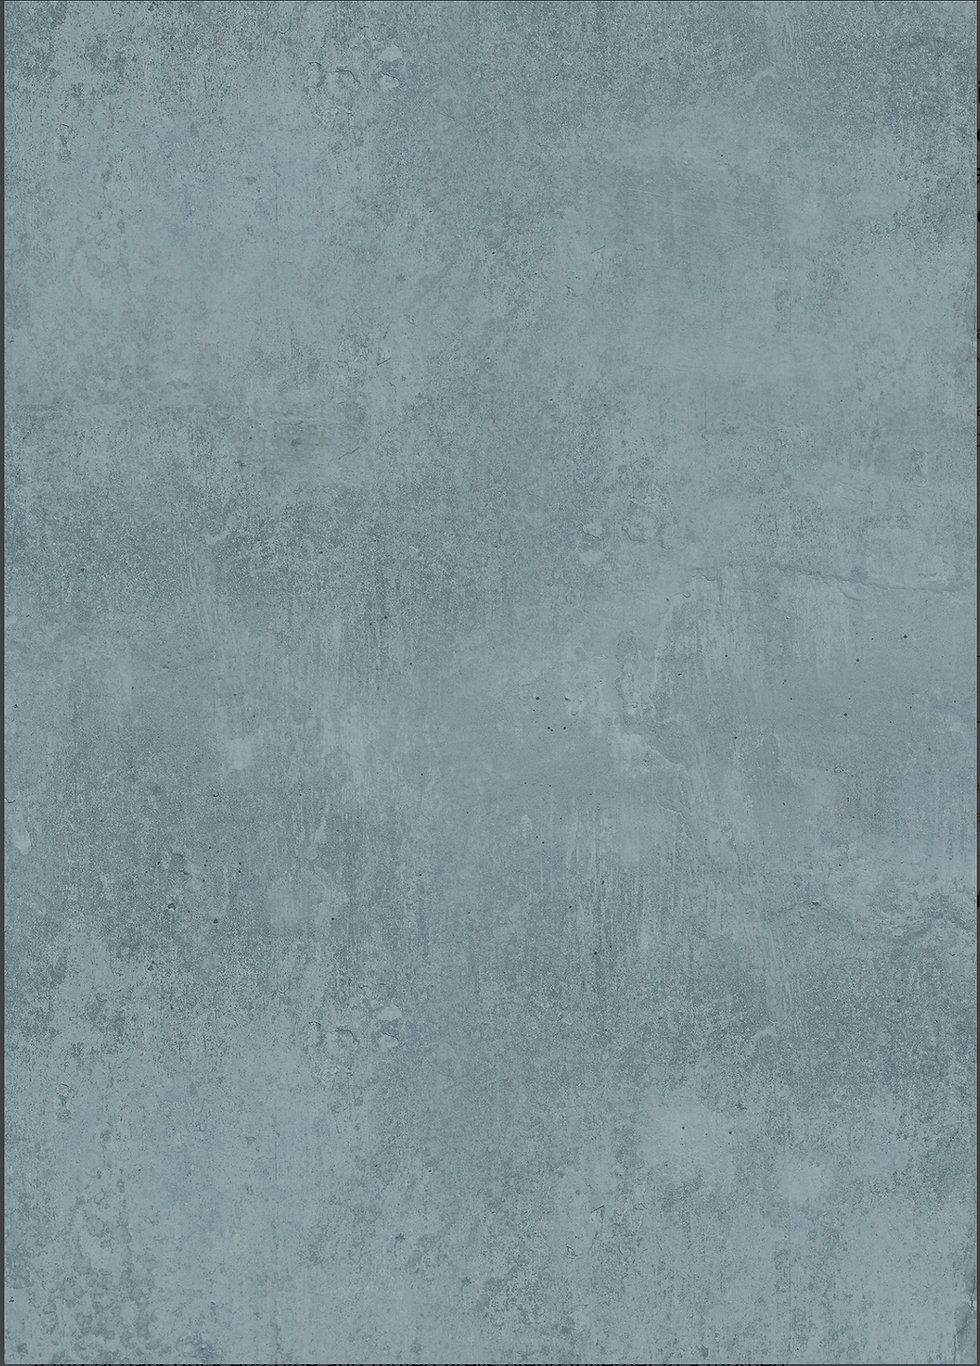 grey blue background.jpg